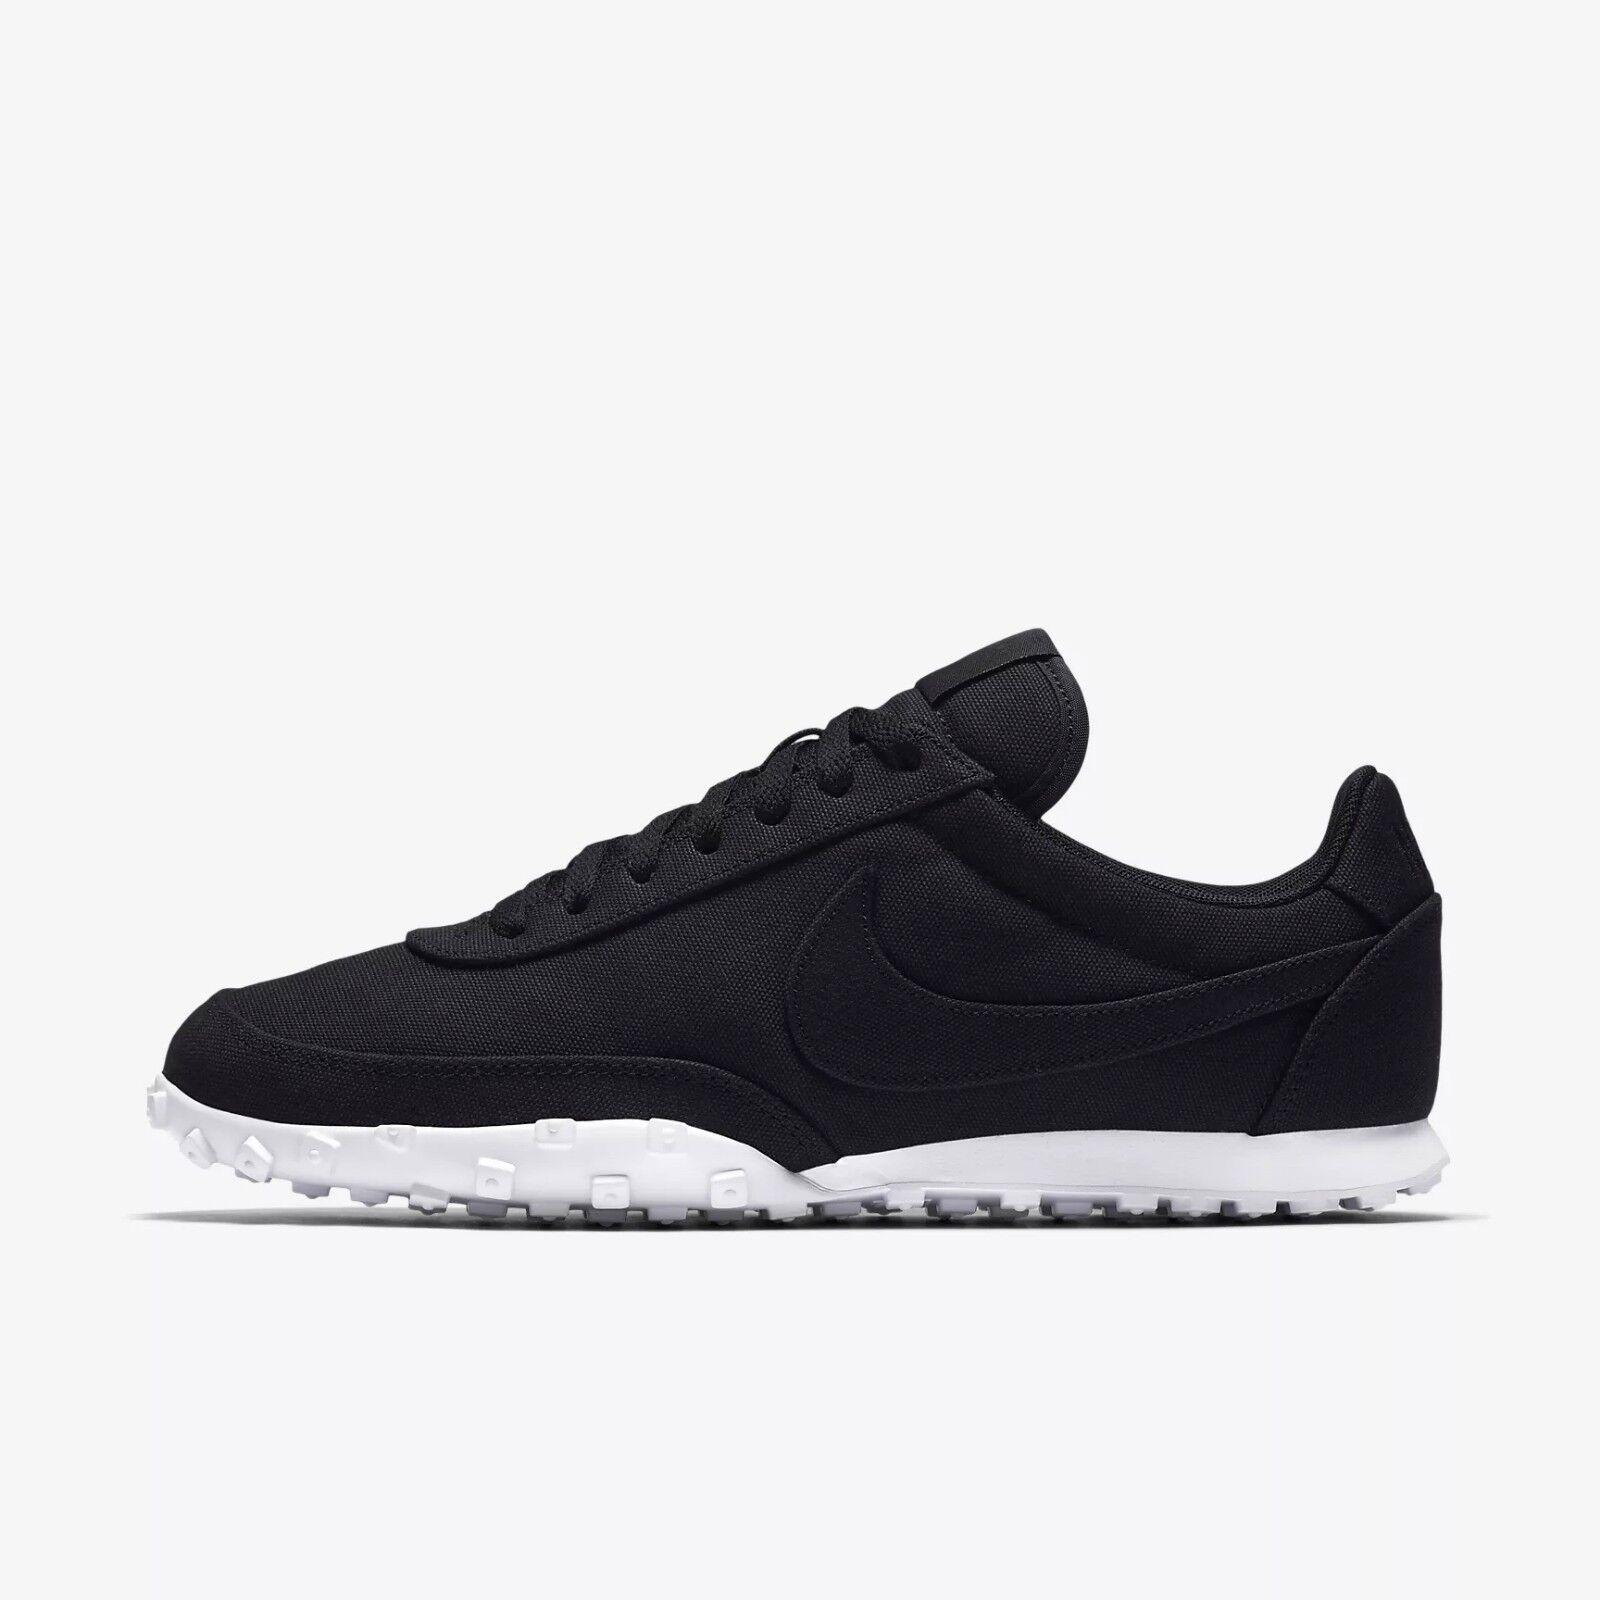 Nike Waffle Racer '17 Textile Men's Running Shoes RARE - Black White 898041-002